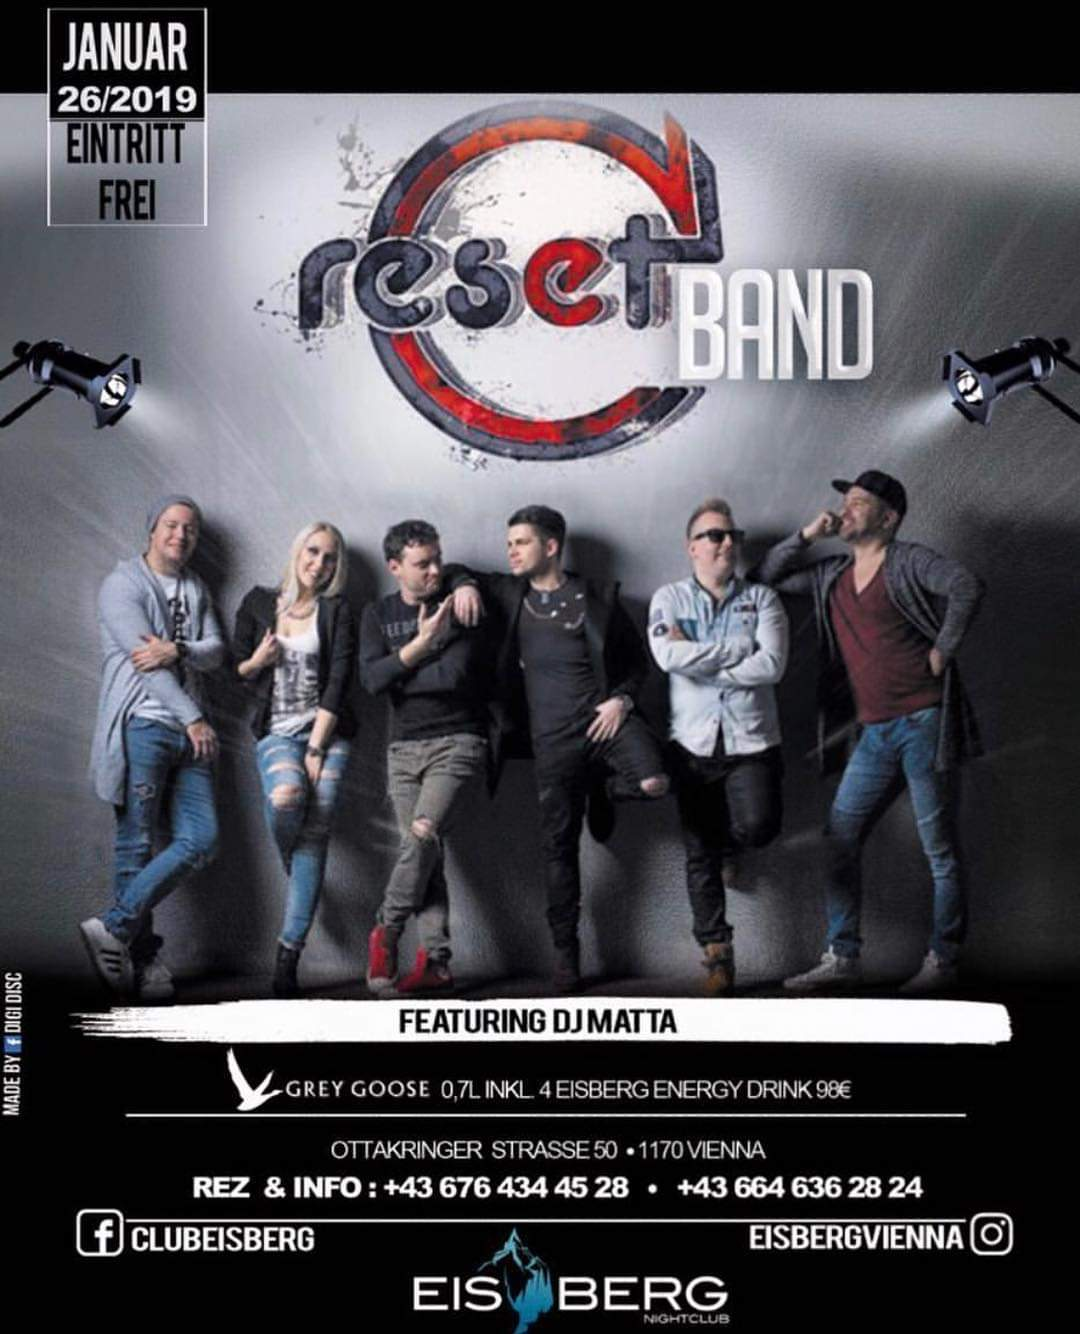 RESET BAND LIVE 26 1 2019 CLUB EISBERG BEC - Infoplay Nightlife